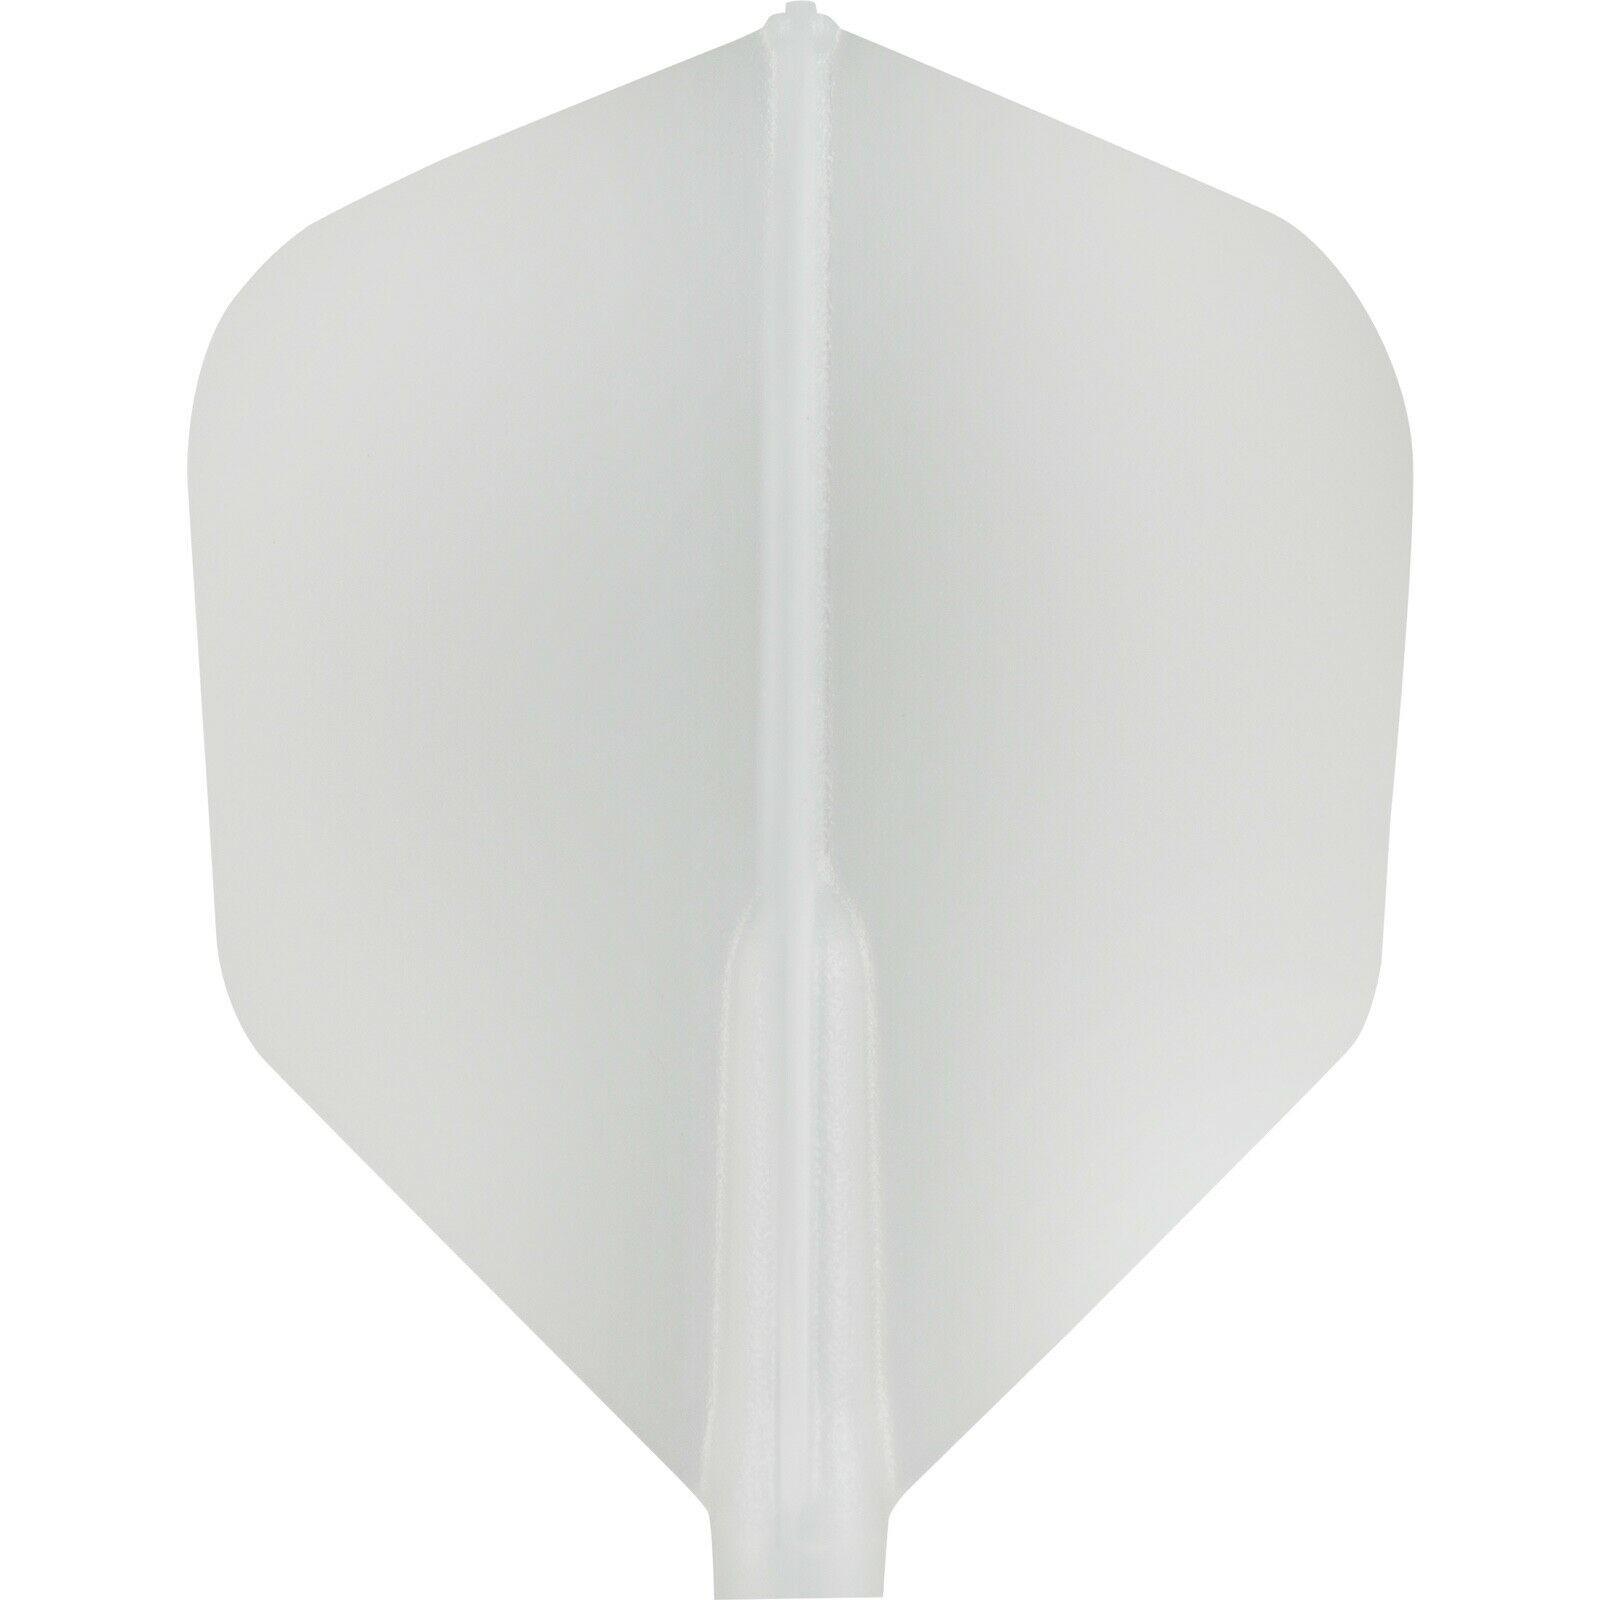 Cosmo Darts - Fit Flight Natural Shape